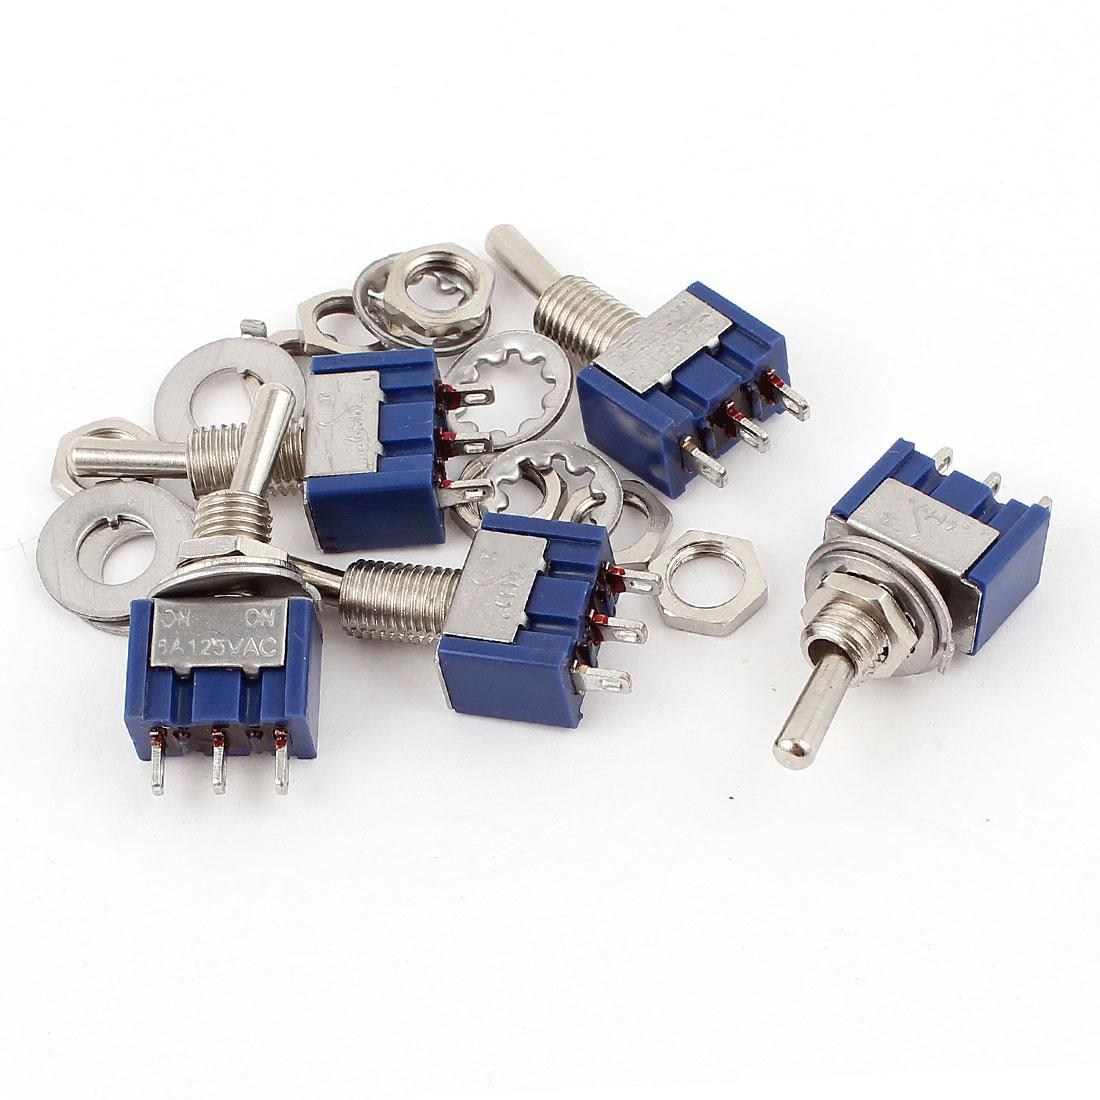 AC125V 6A 250V 3A 3 Pins SPDT On/On 2 Position Mini Toggle Switch 5 Pcs